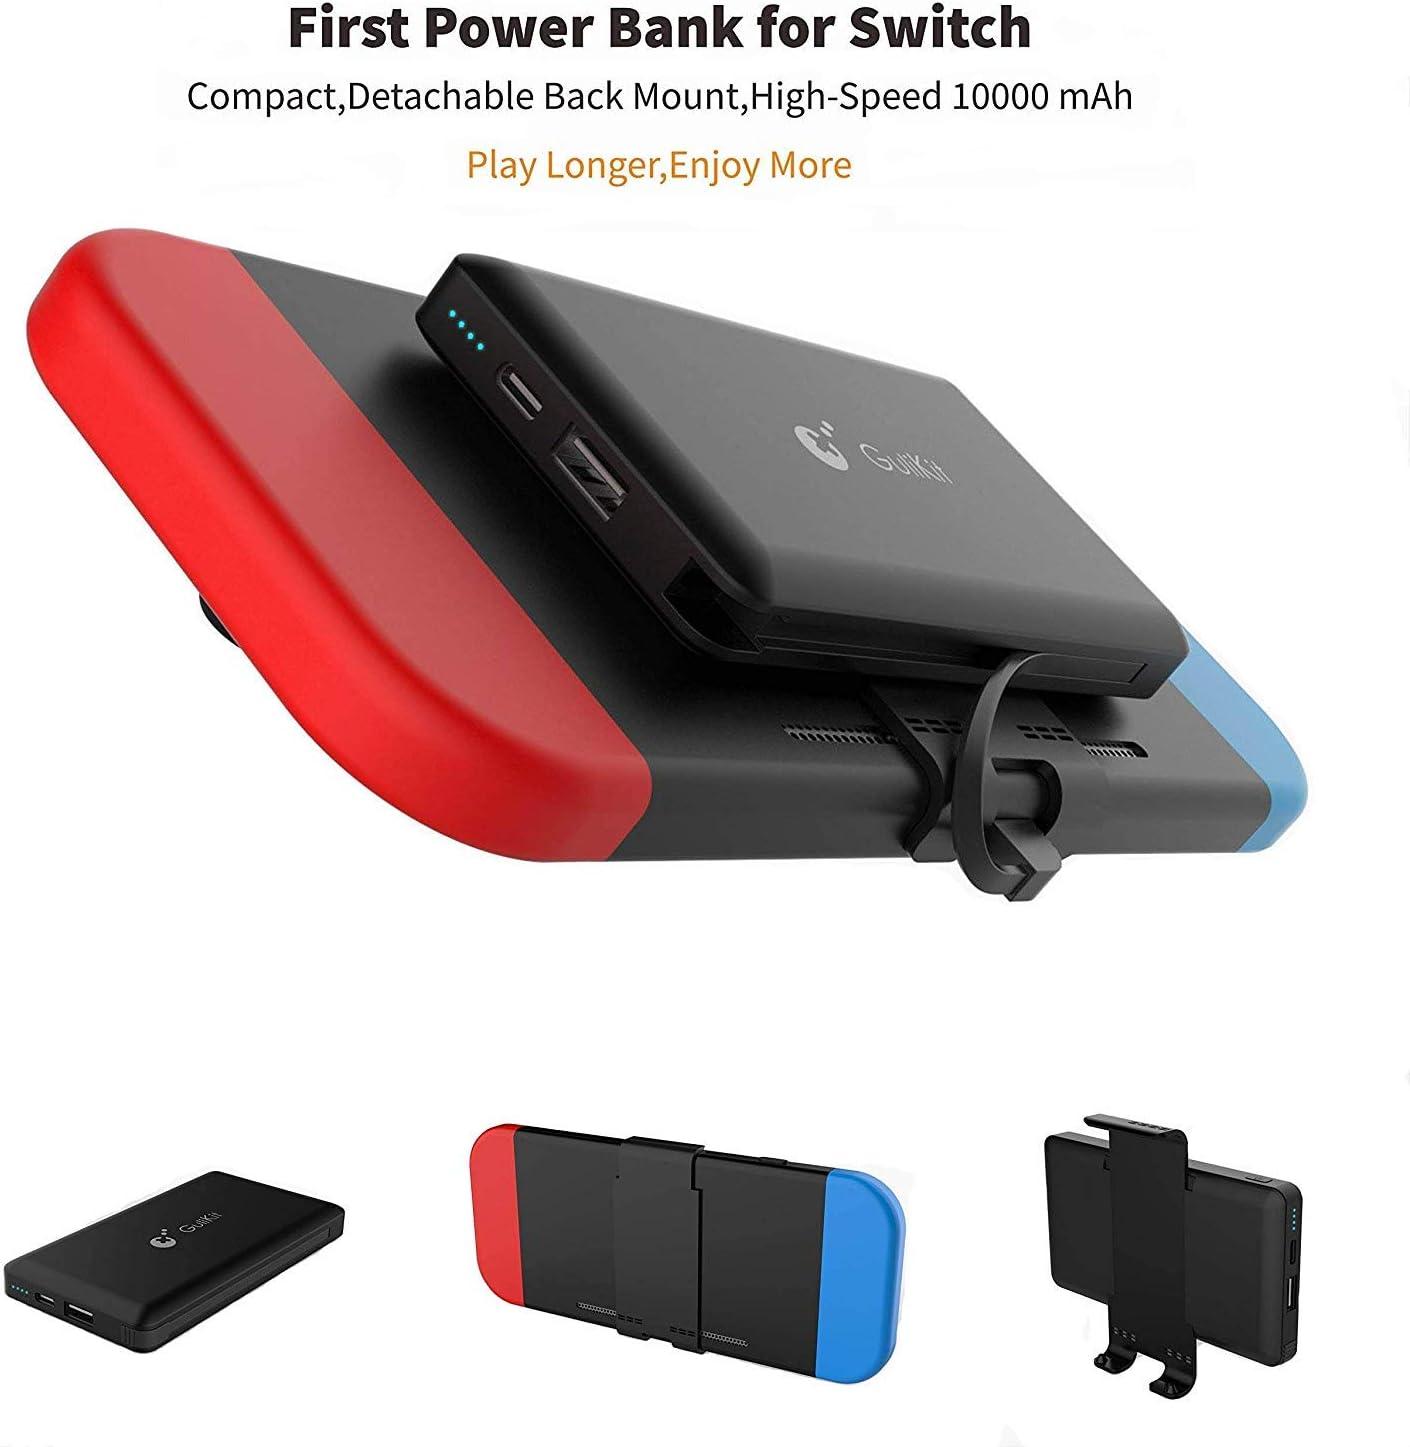 Banco de energía portátil 10000mAh Power Bank para Nintendo Switch Accesorios -Cargador de Baterías recargable extendido Funda -Paquete de batería de reserva de viaje compacto para Nintendo Switch: Amazon.es: Videojuegos